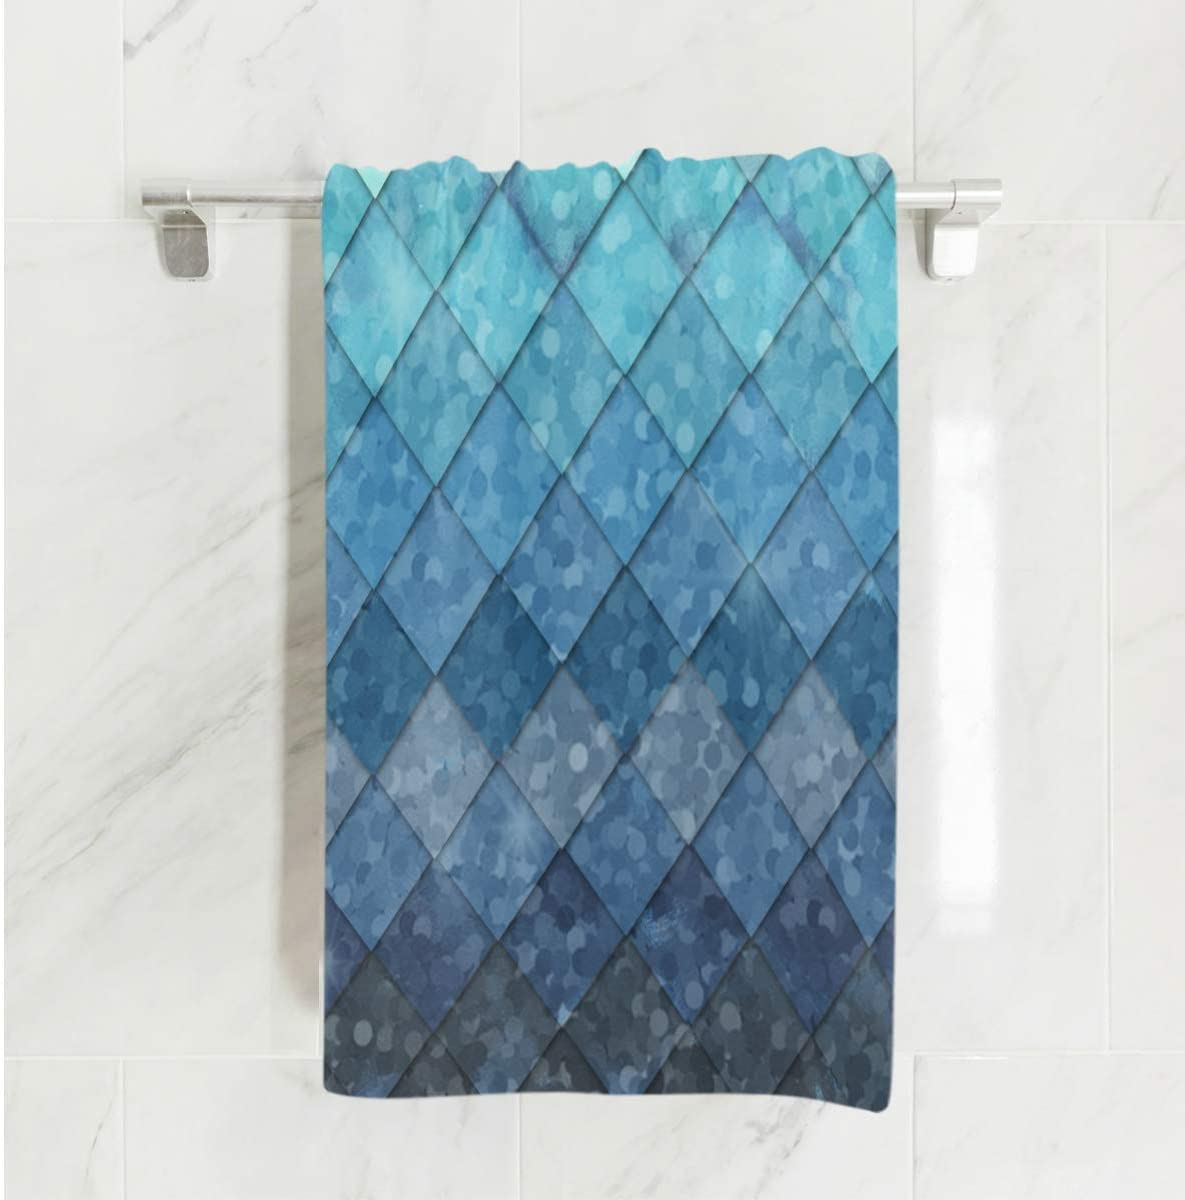 Extra-Absorbent Soft Beach Towels American Flag Luxury Microfiber Spa/&Hotel Bath Towels 31.5 x 51.2 inch